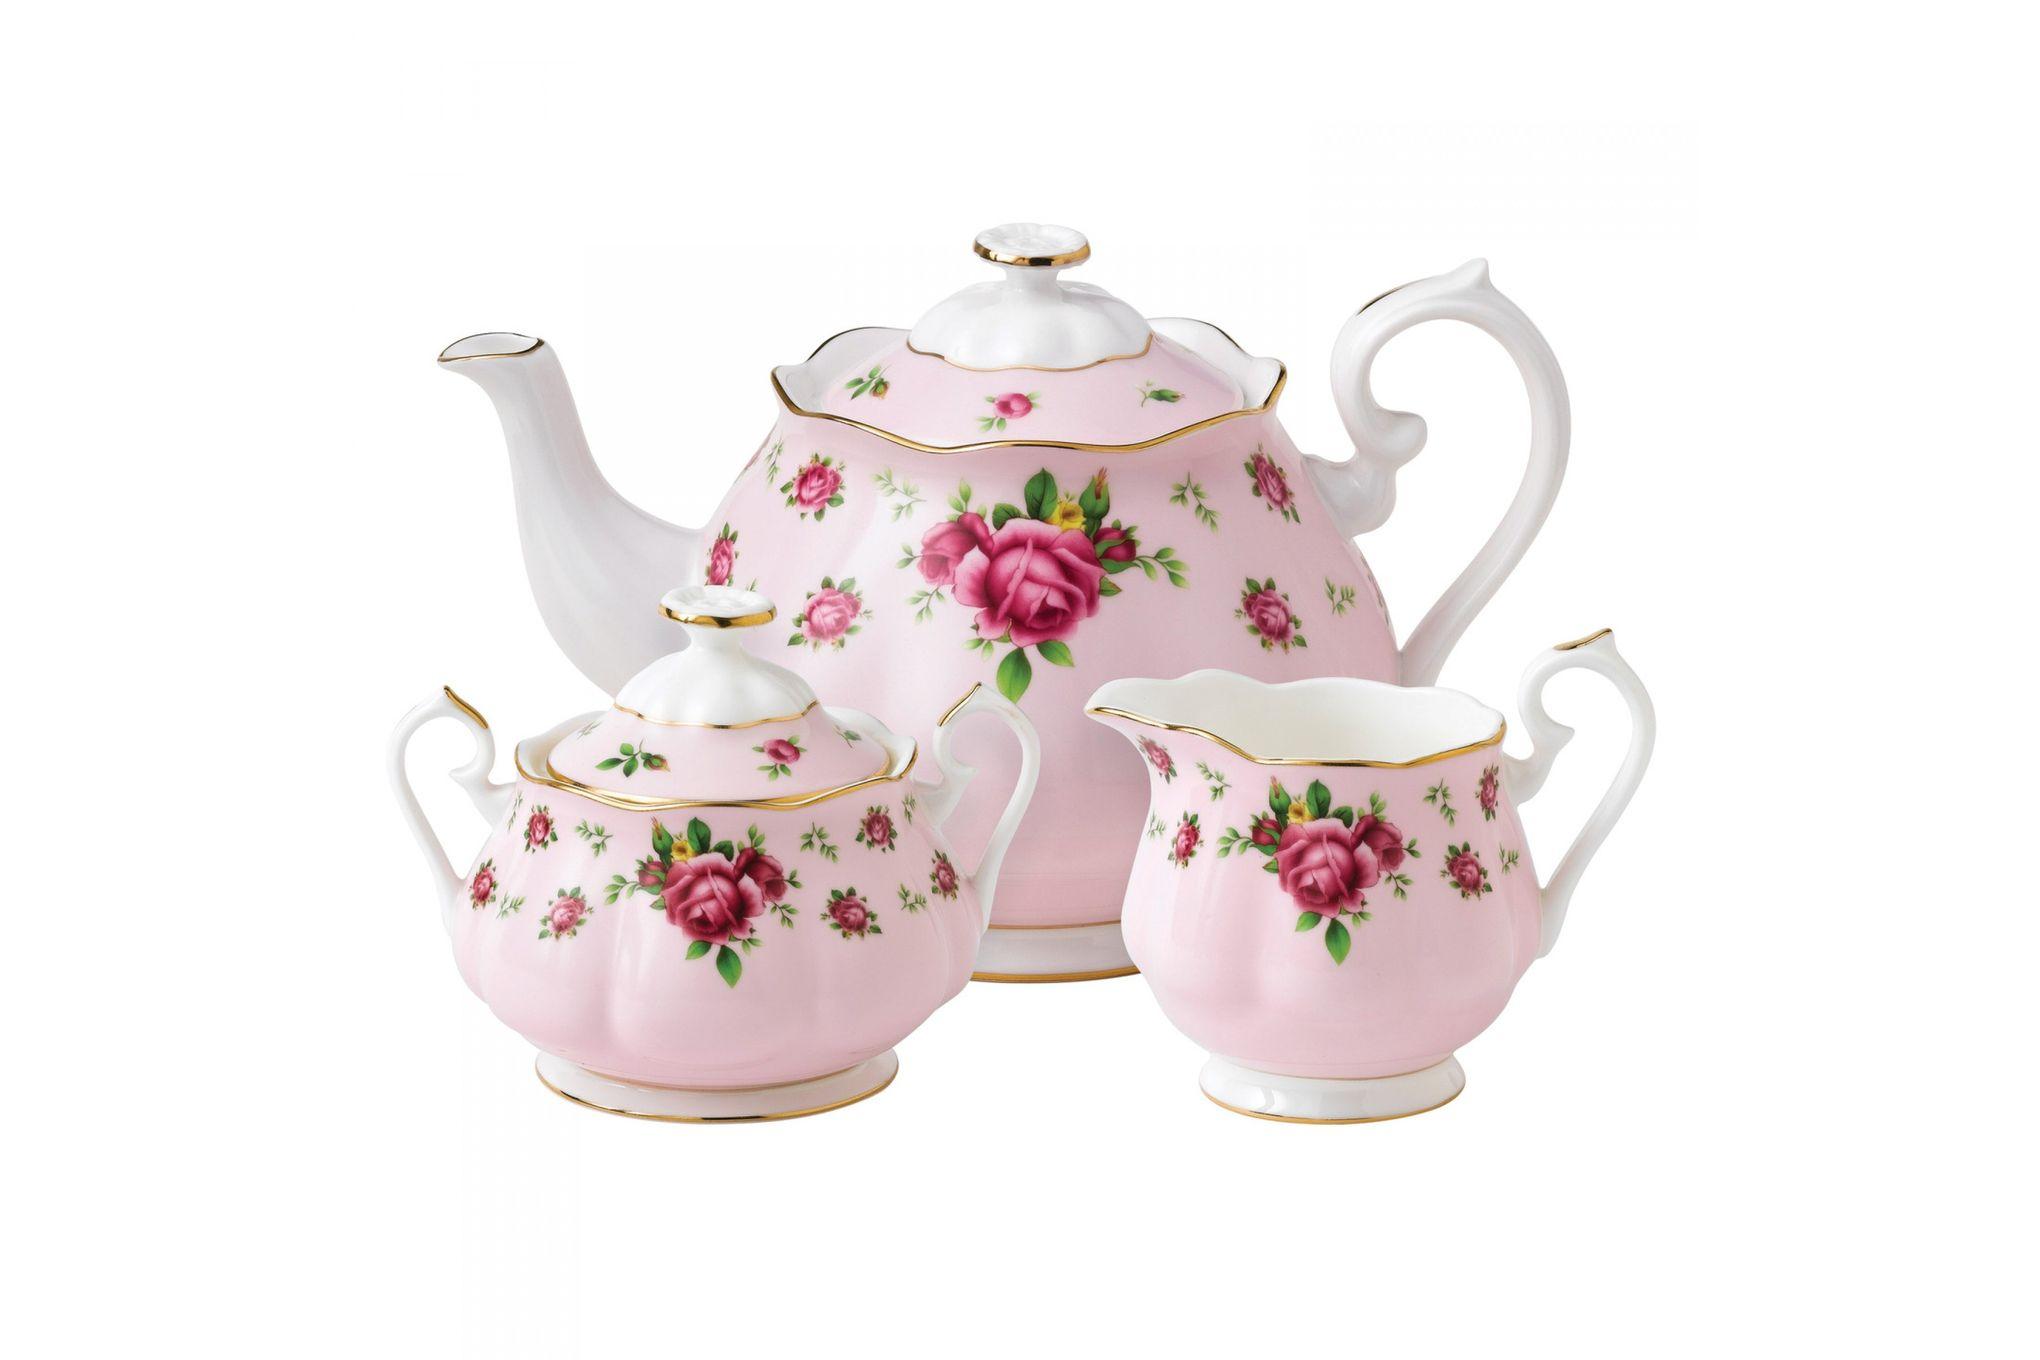 Royal Albert New Country Roses Pink 3 Piece Tea set Teapot, Sugar, Creamer thumb 1